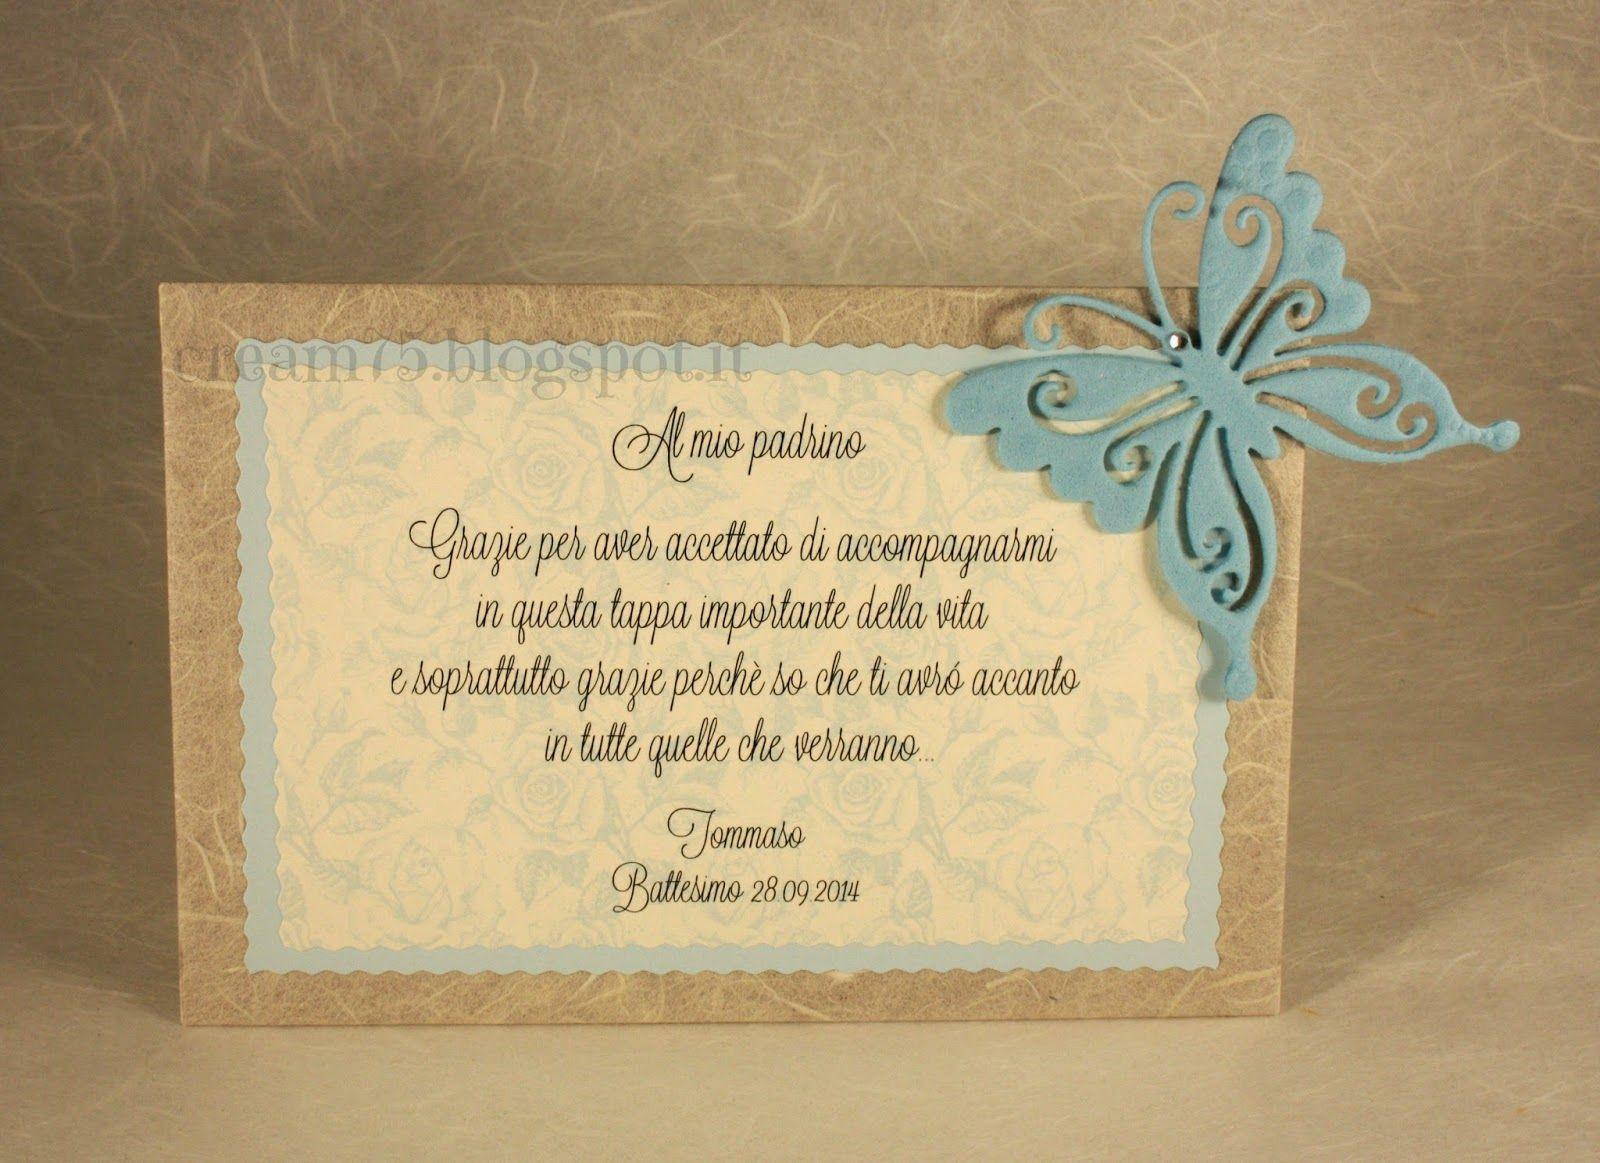 Auguri Matrimonio Bibbia : Belle frasi per invito battesimo bs regardsdefemmes